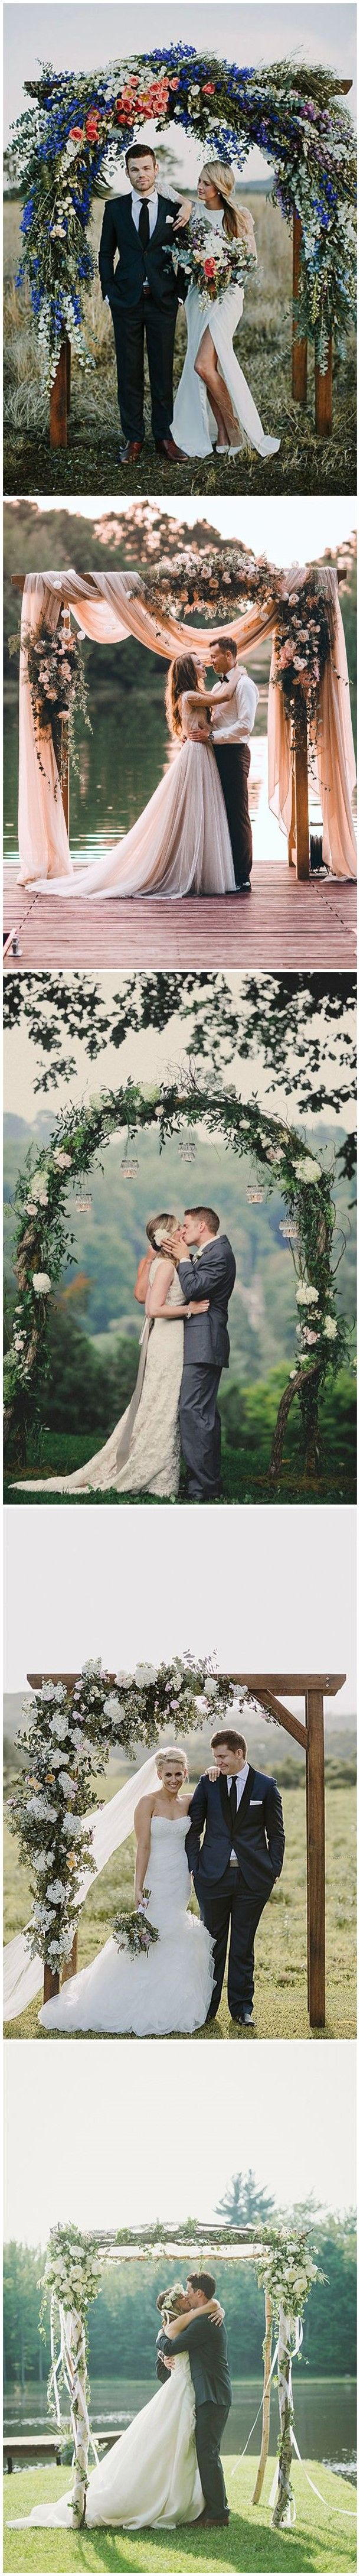 20 diy floral wedding arch decoration ideas floral wedding arch 20 diy floral wedding arch decoration ideas junglespirit Images